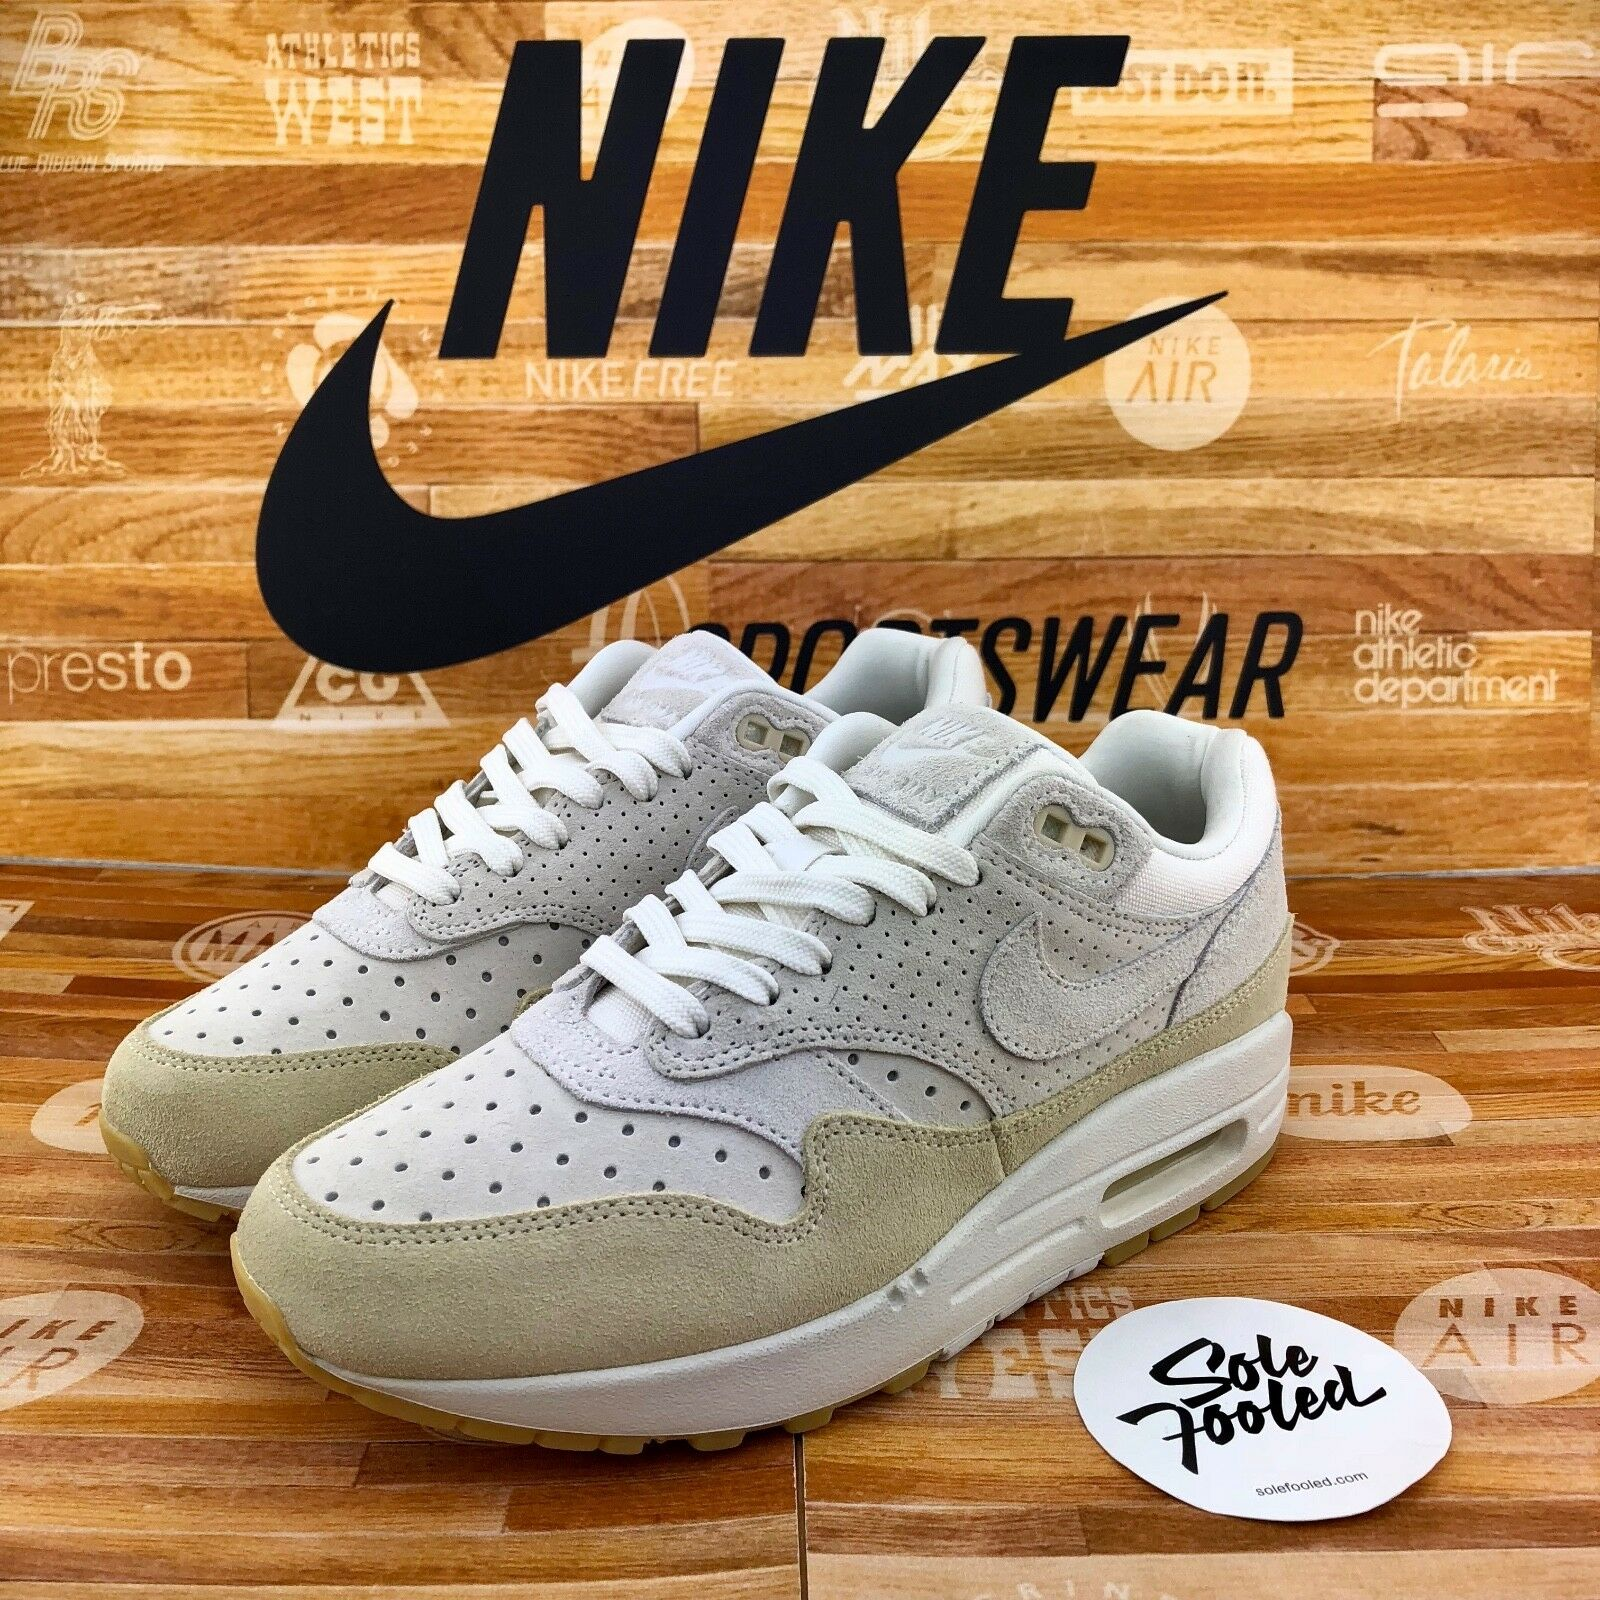 Nike wmns Air Max 1 1 1 PRM 454746 110-Sail Fossil 37.5 40 6.5 8.5 og 87 90 95 97  compras en linea